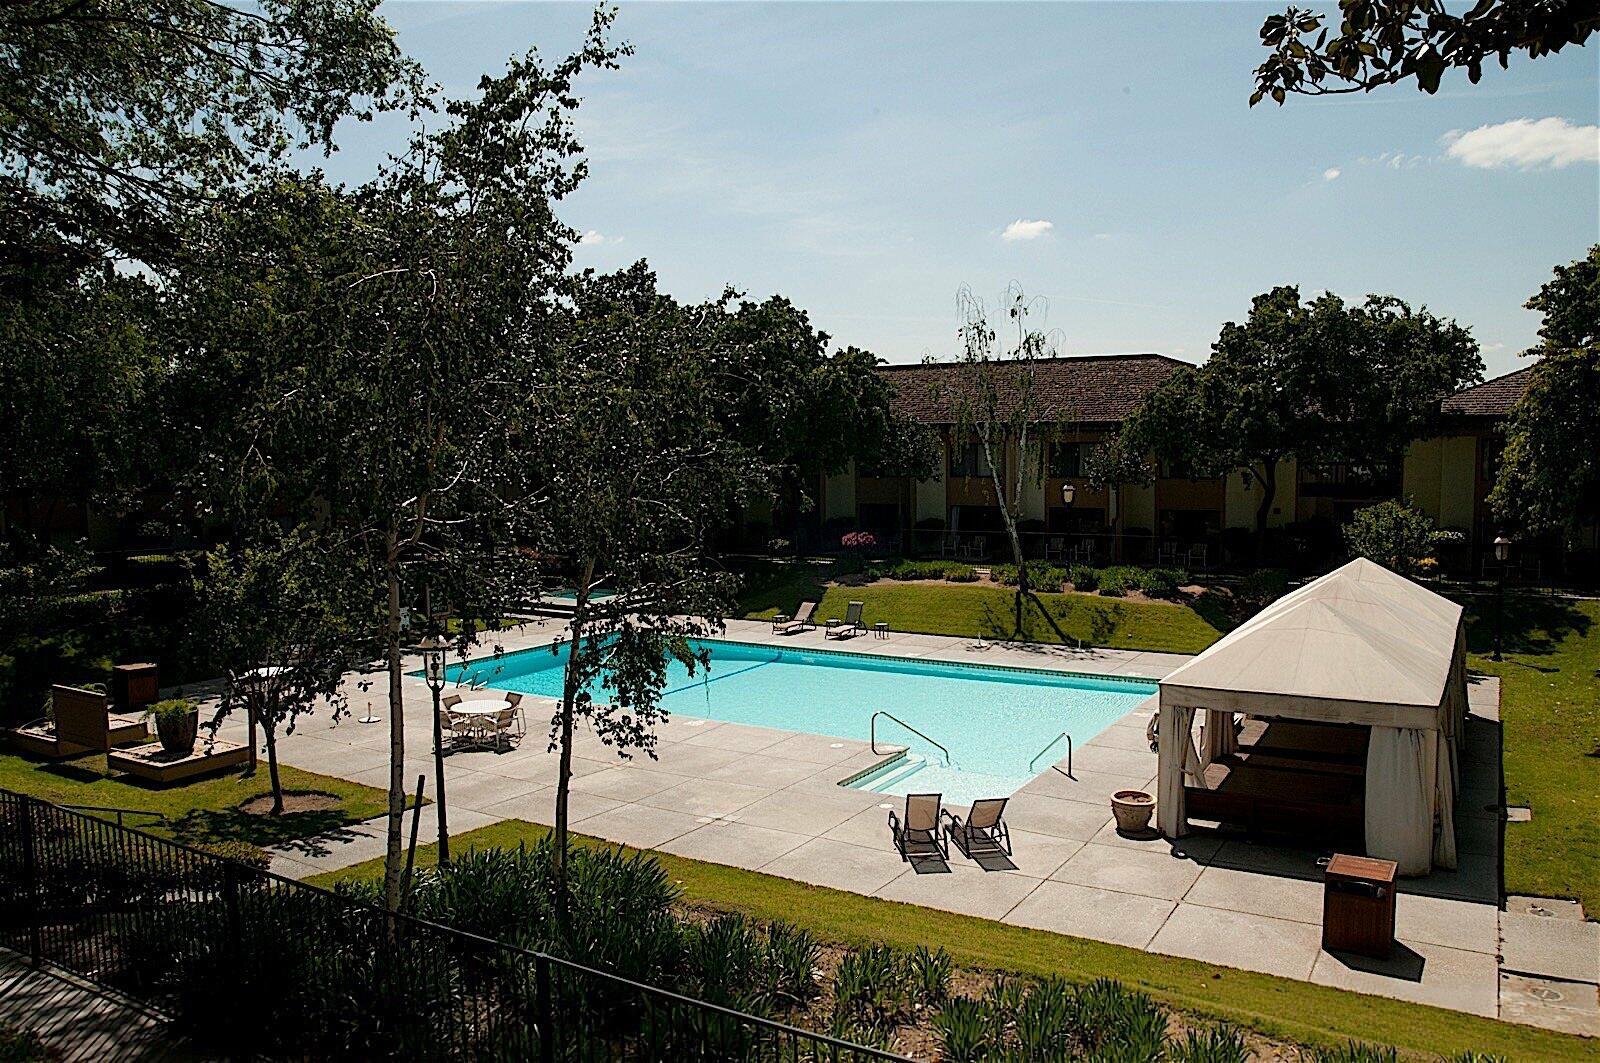 Hotel Fresno Outdoor Pool